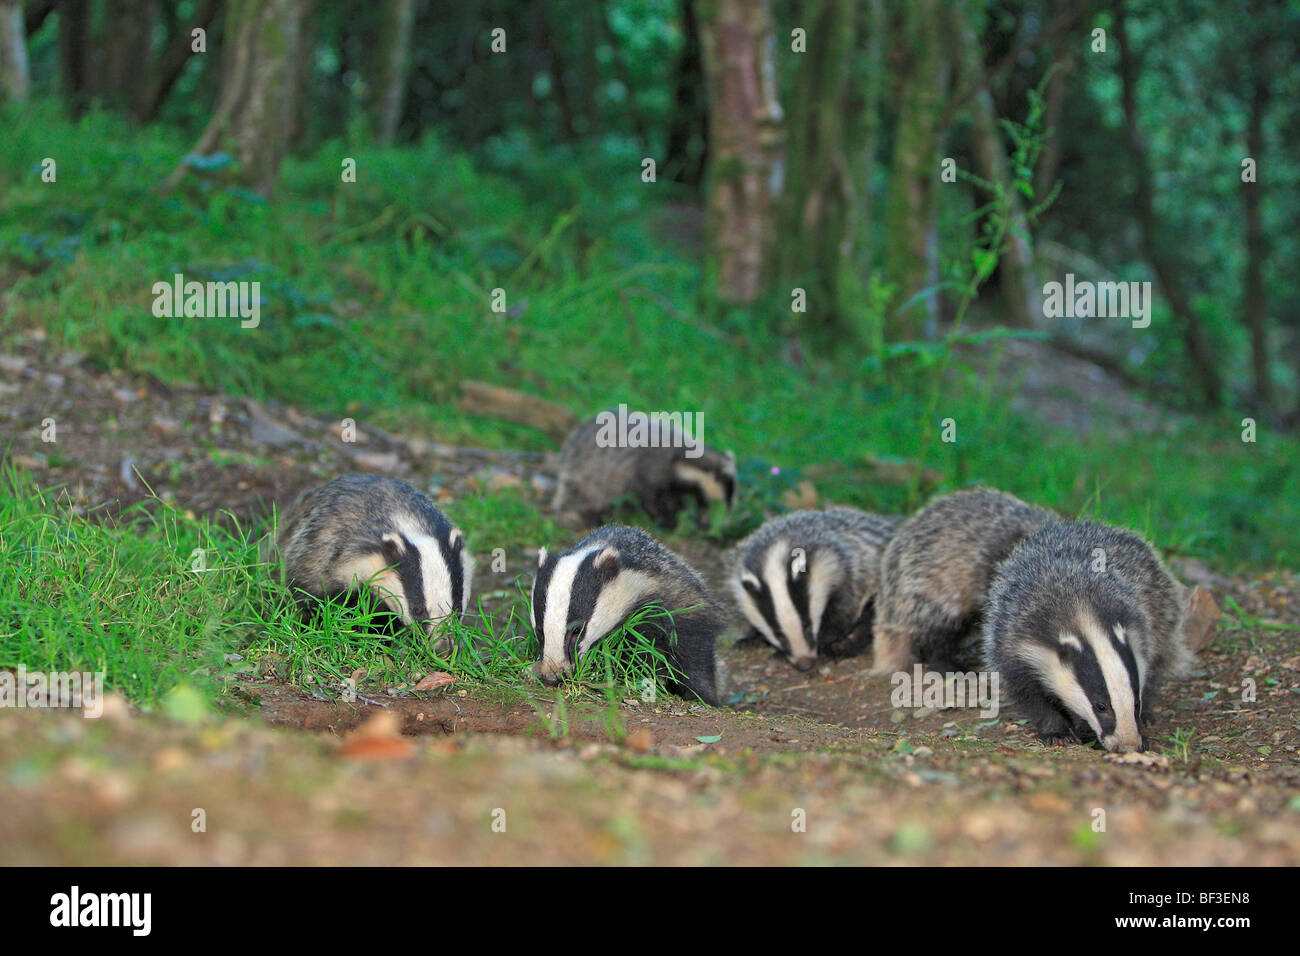 European Badger (Meles meles). Family foraging in a forest. - Stock Image